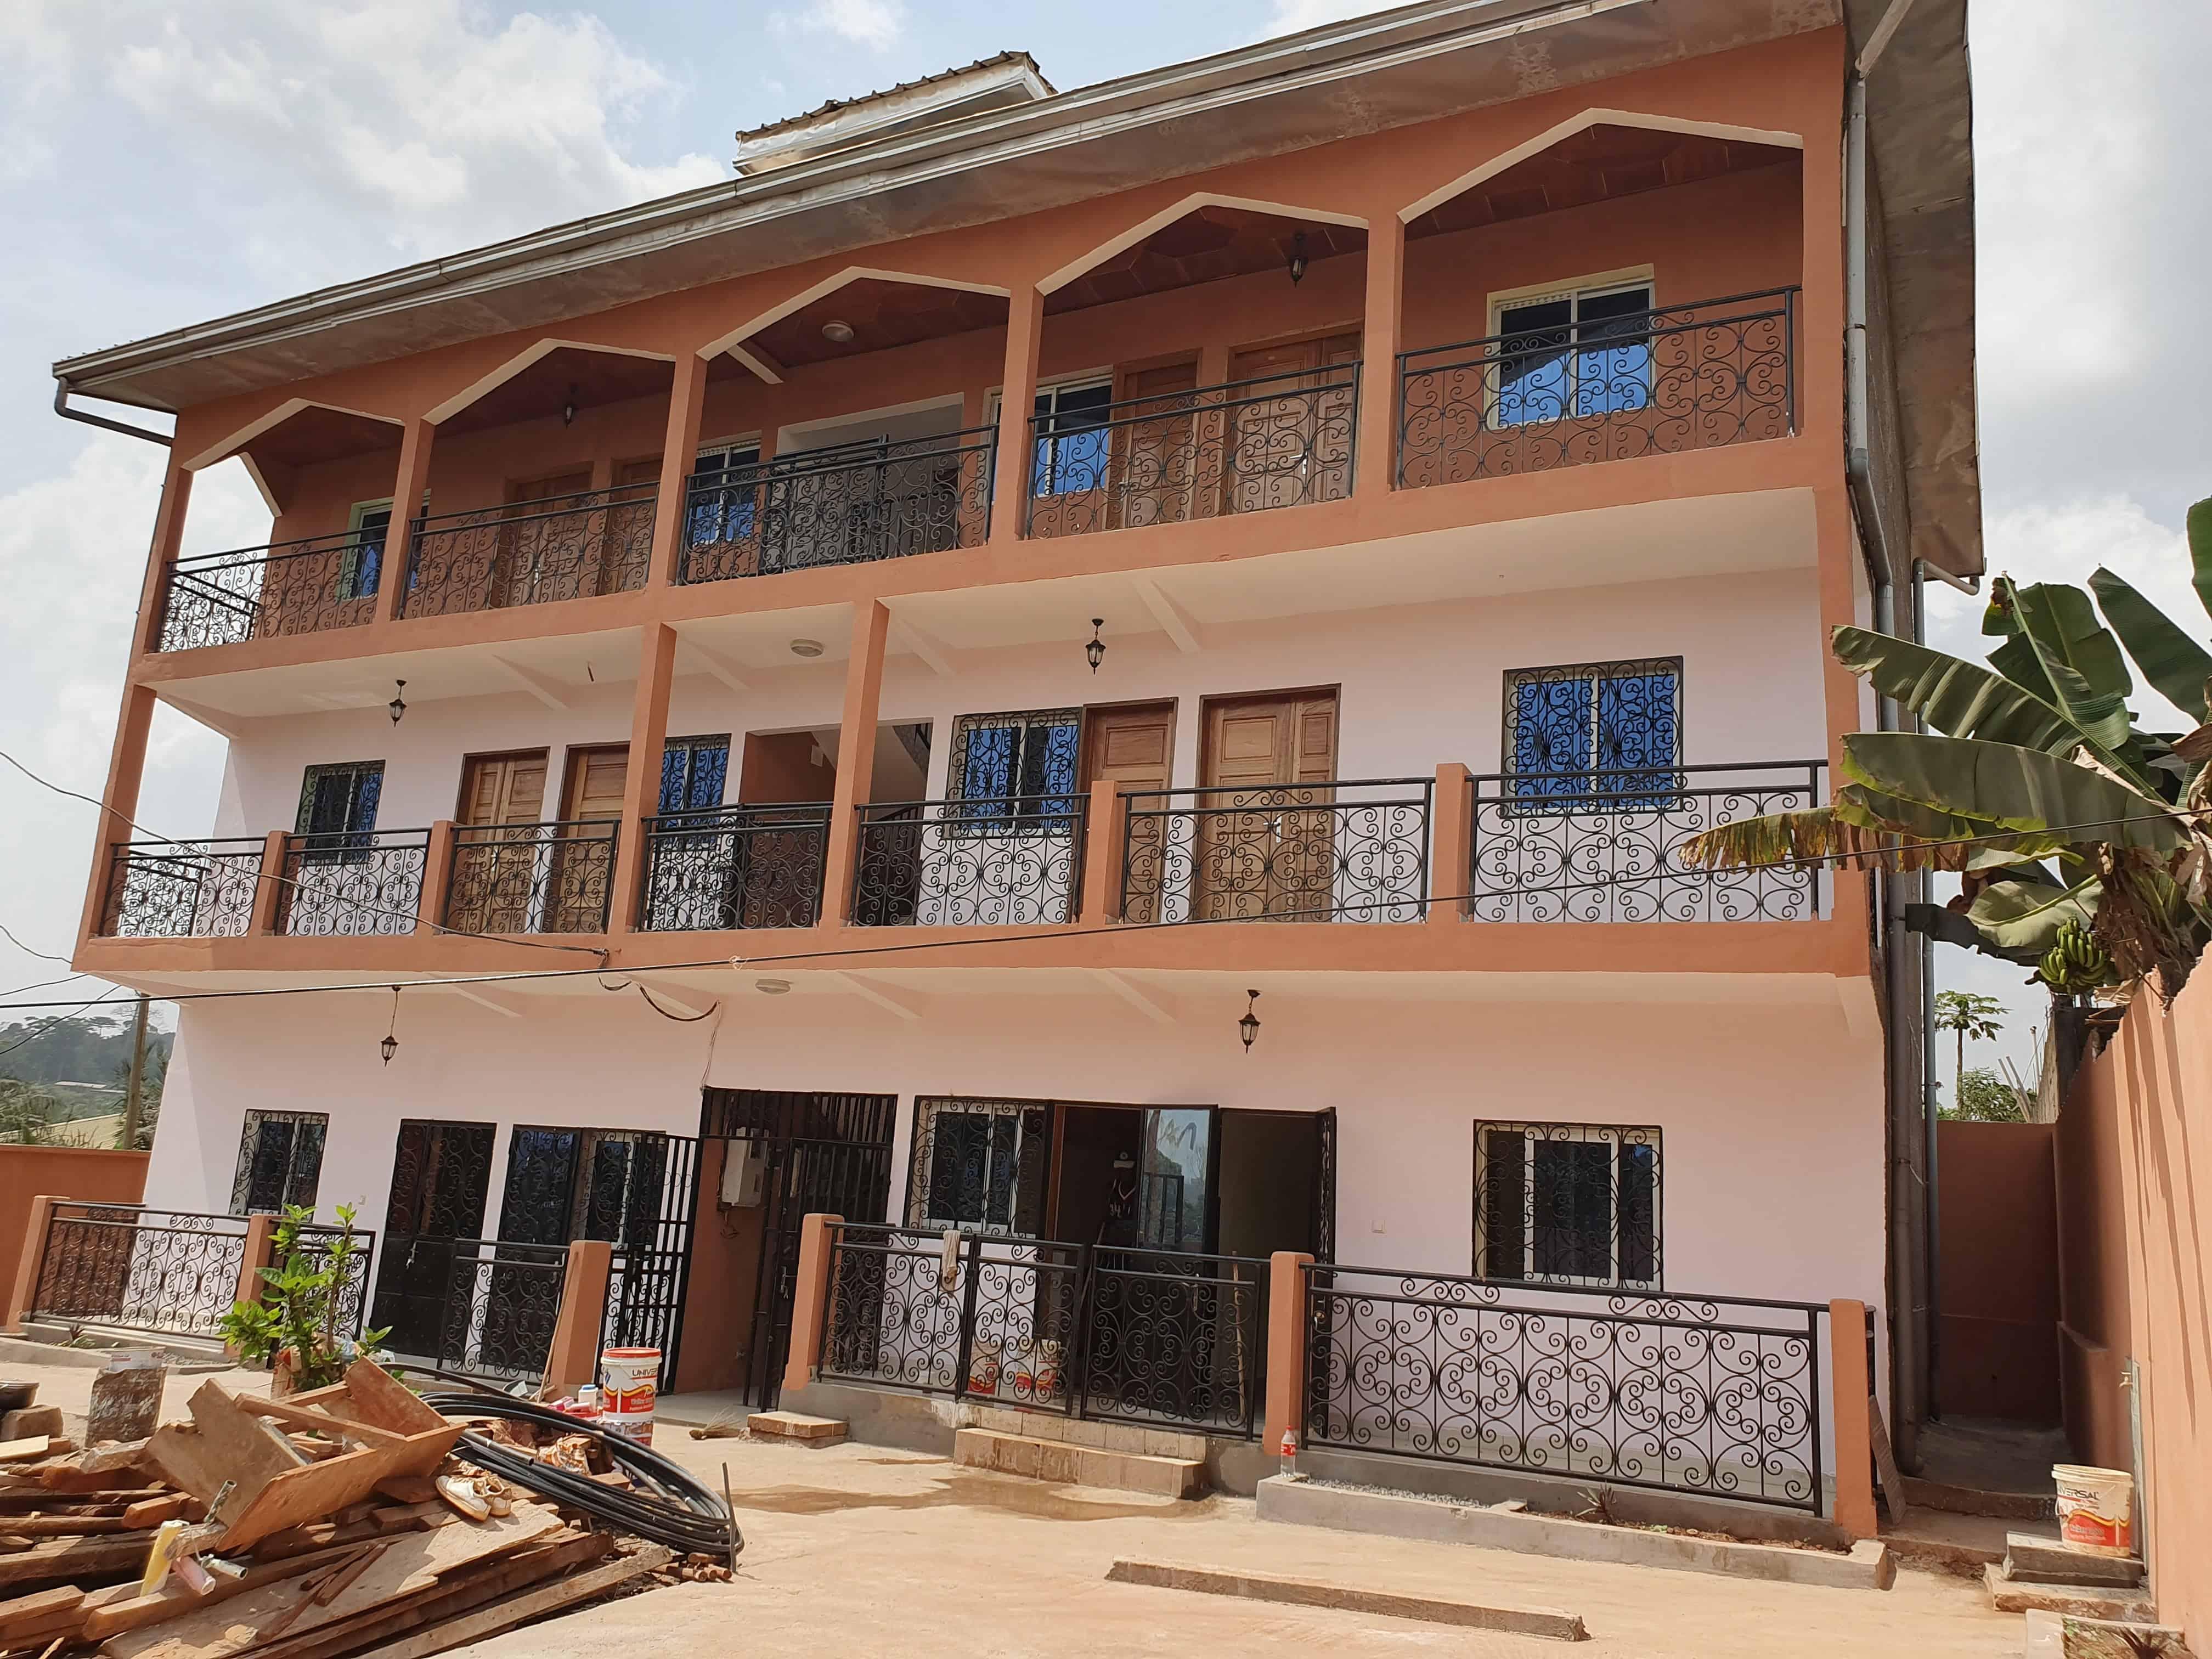 Apartment to rent - Yaoundé, Simbock, Monté mechecam - 1 living room(s), 2 bedroom(s), 1 bathroom(s) - 80 000 FCFA / month